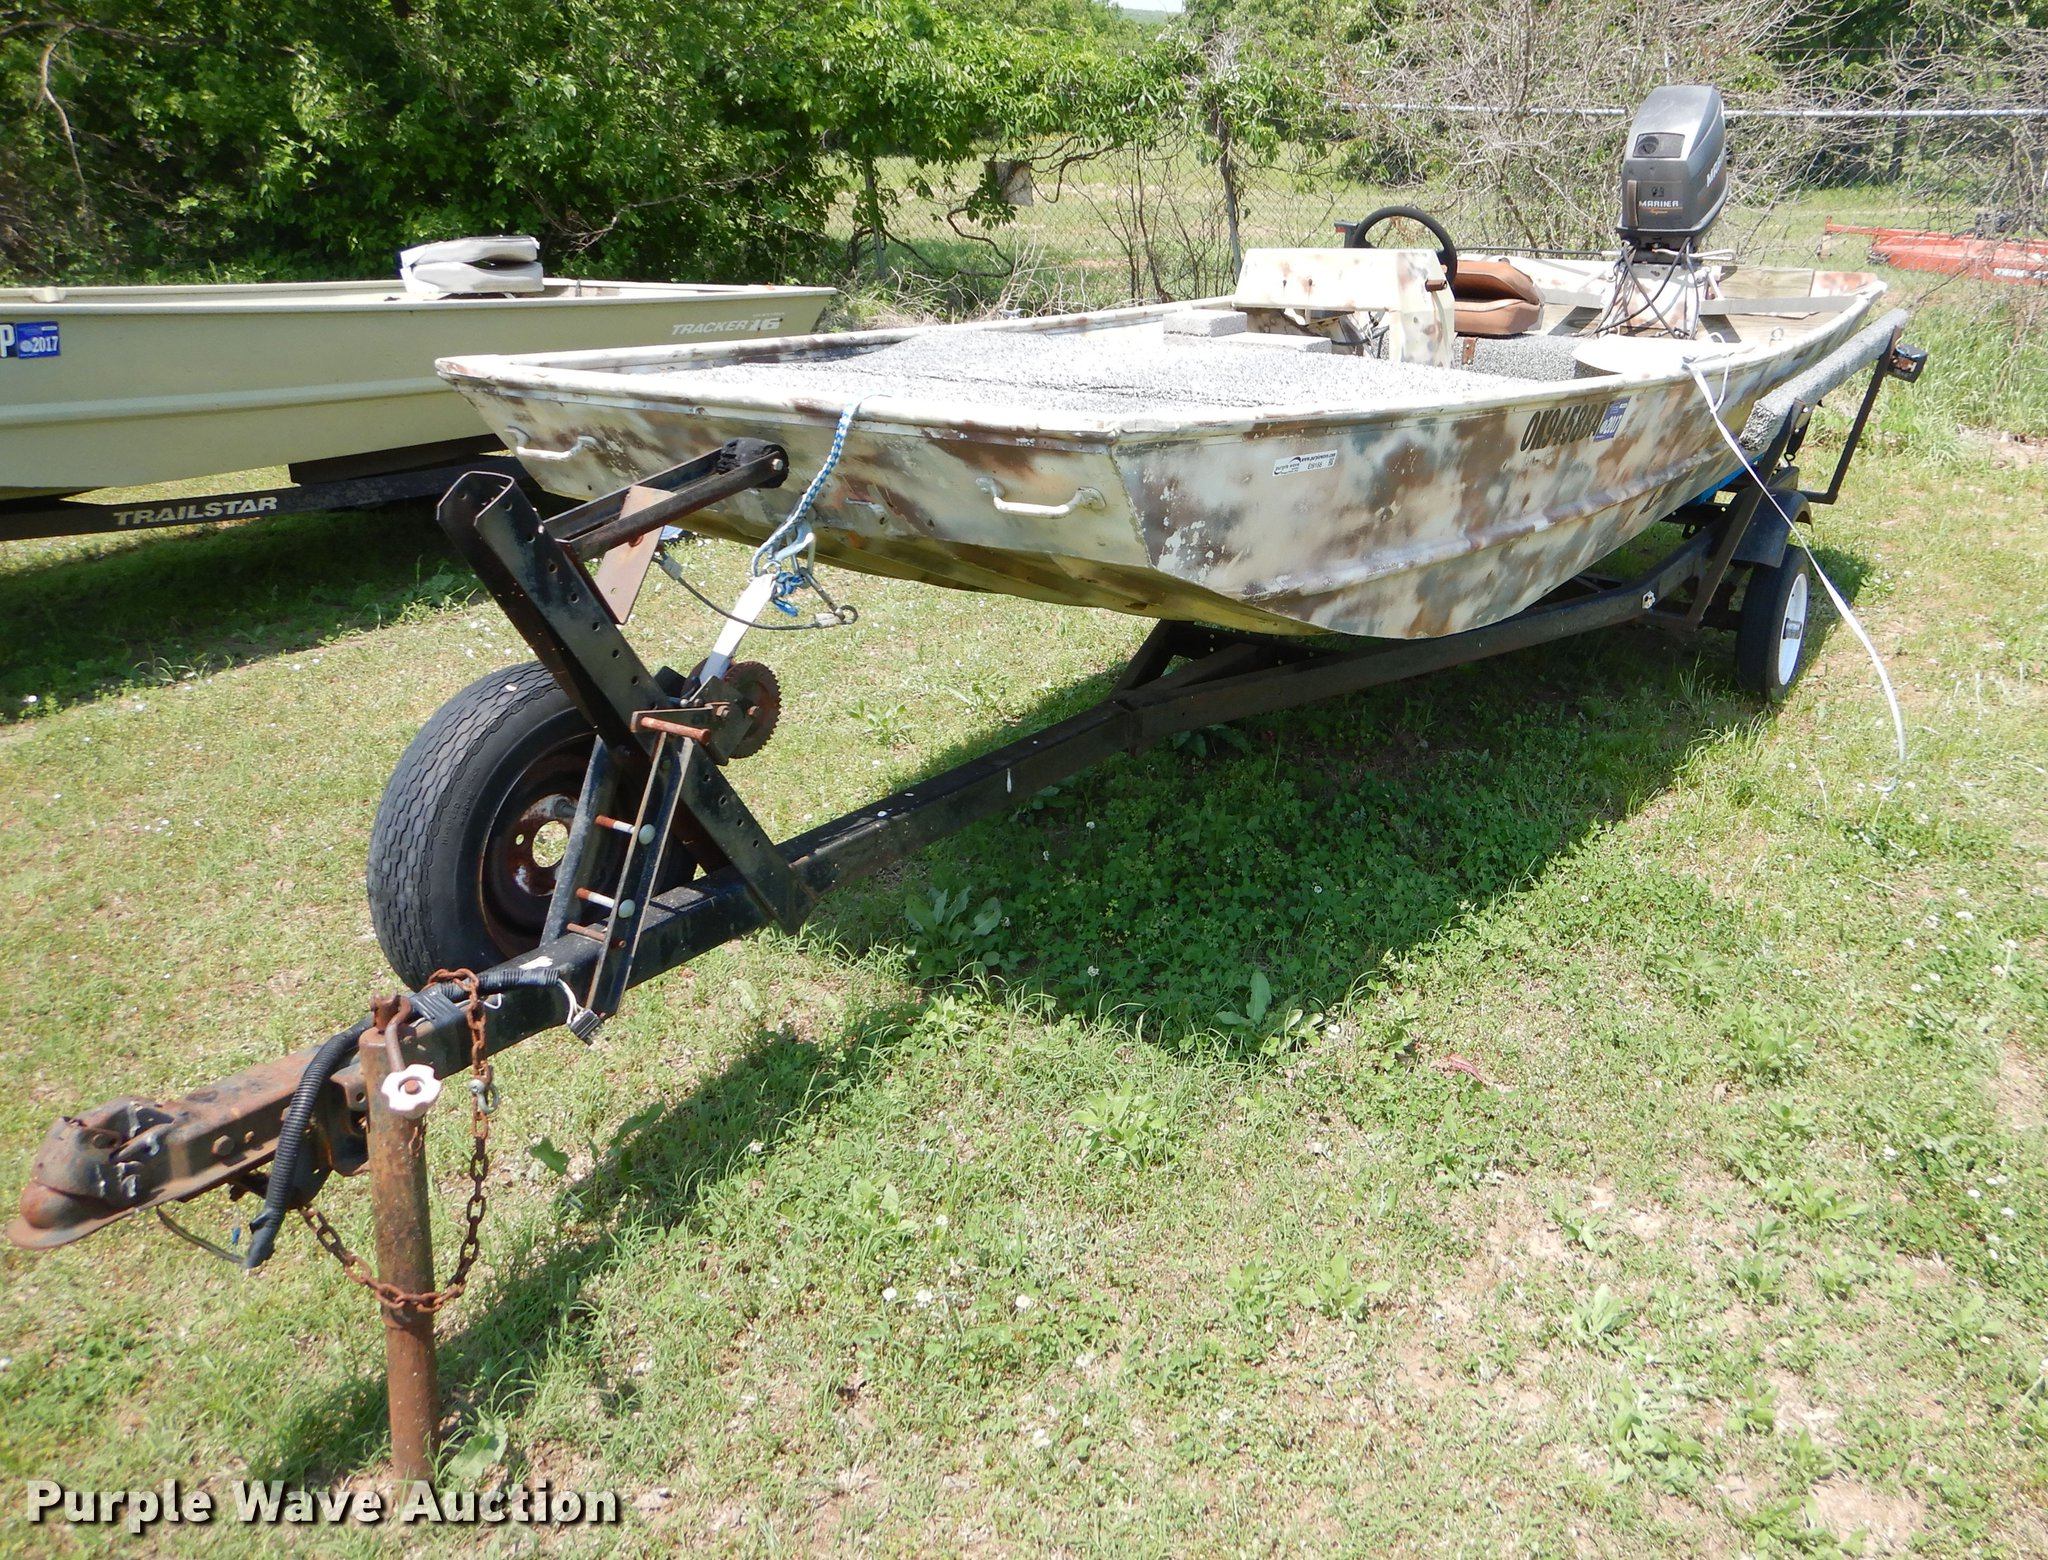 1982 Loweline aluminum flat bottom boat in Okmulgee, OK | Item